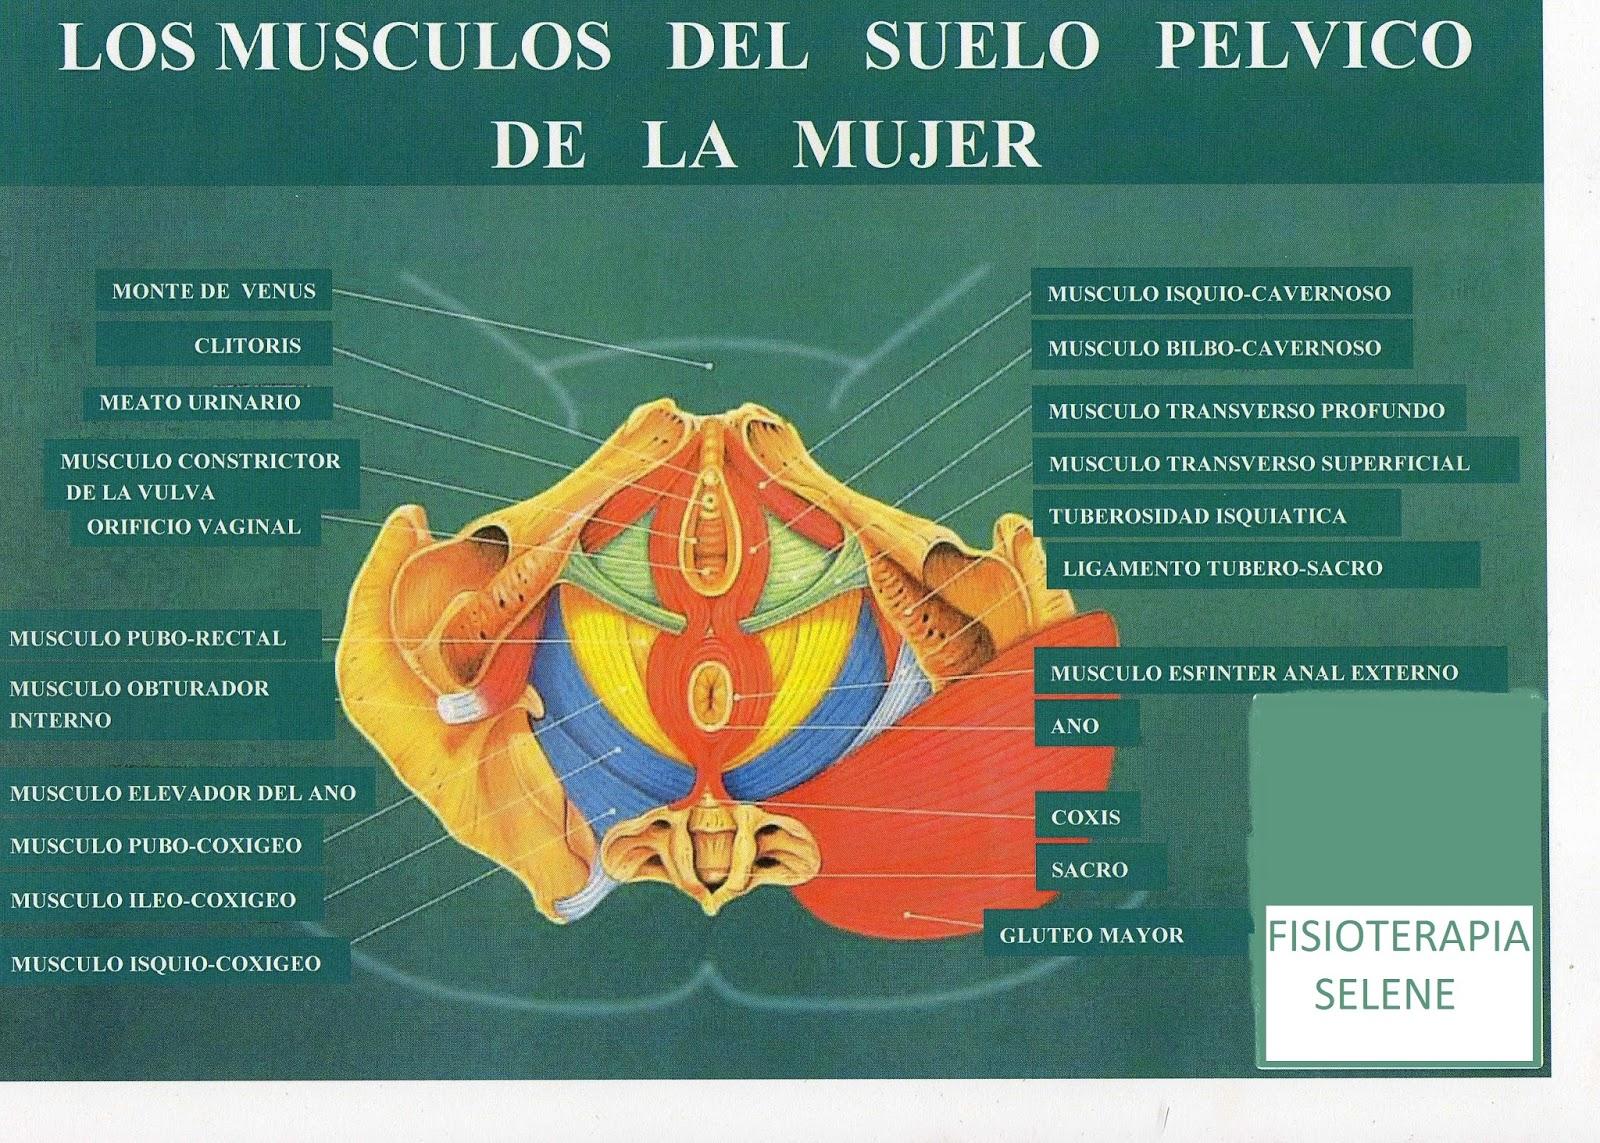 Fisioterapia Selene: 2015